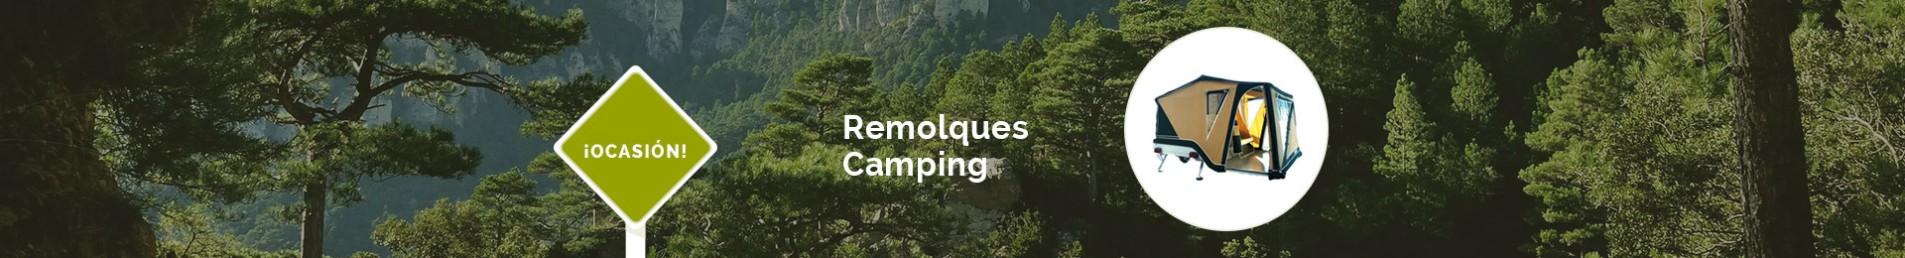 Remolques Camping